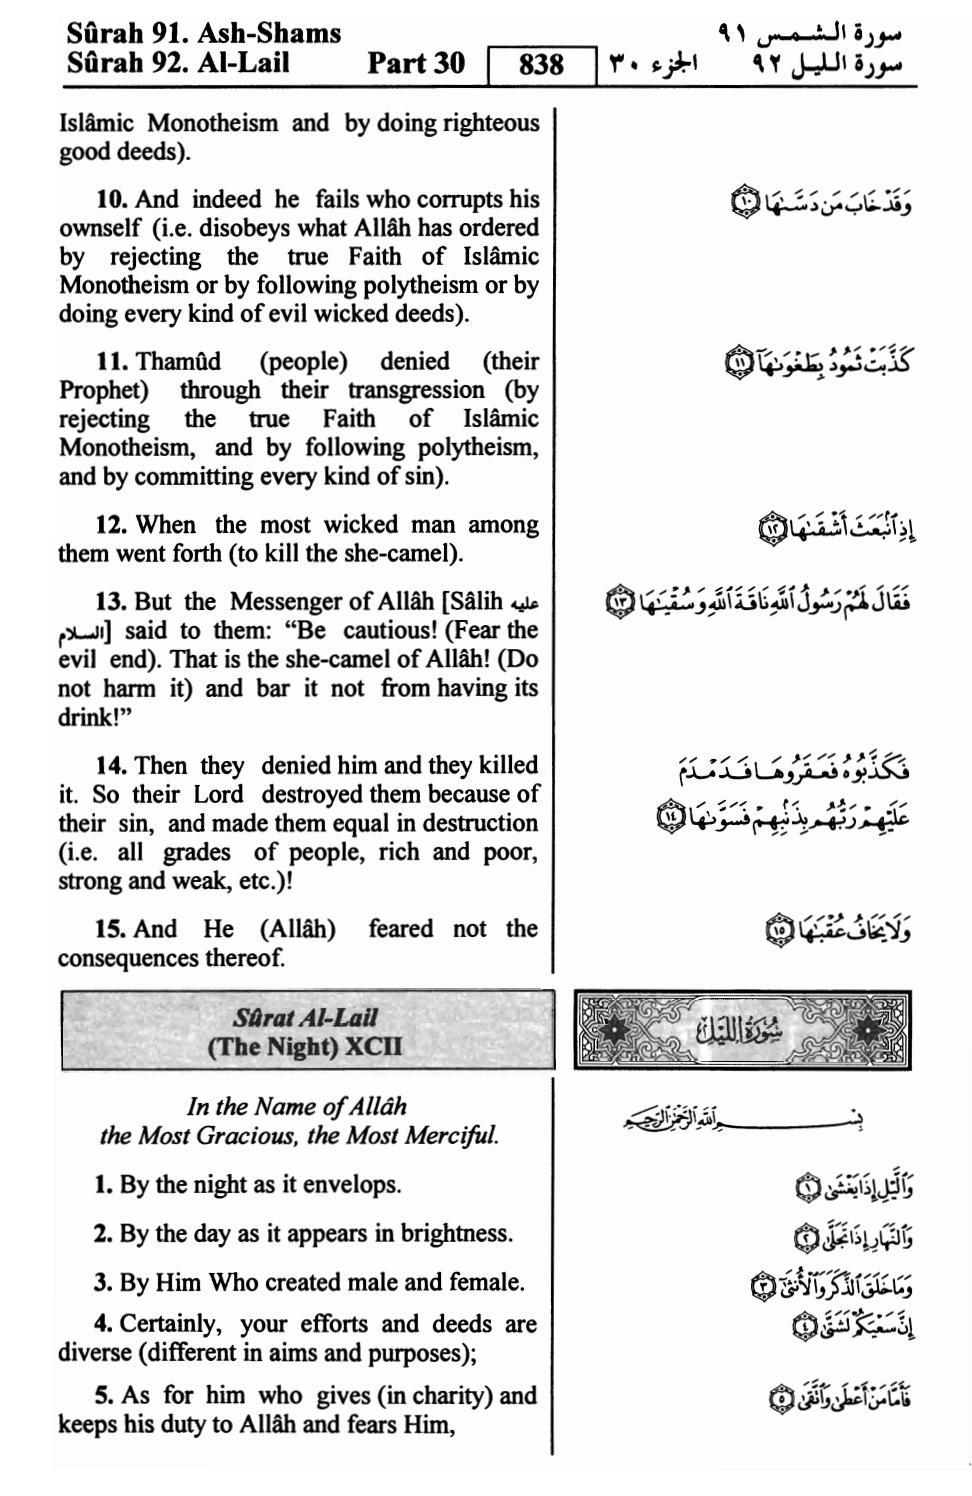 Pdf Quran English Translation Surah 92 الليل Al Lail With Arabic Text By Daaiyat Ul Islam Issuu